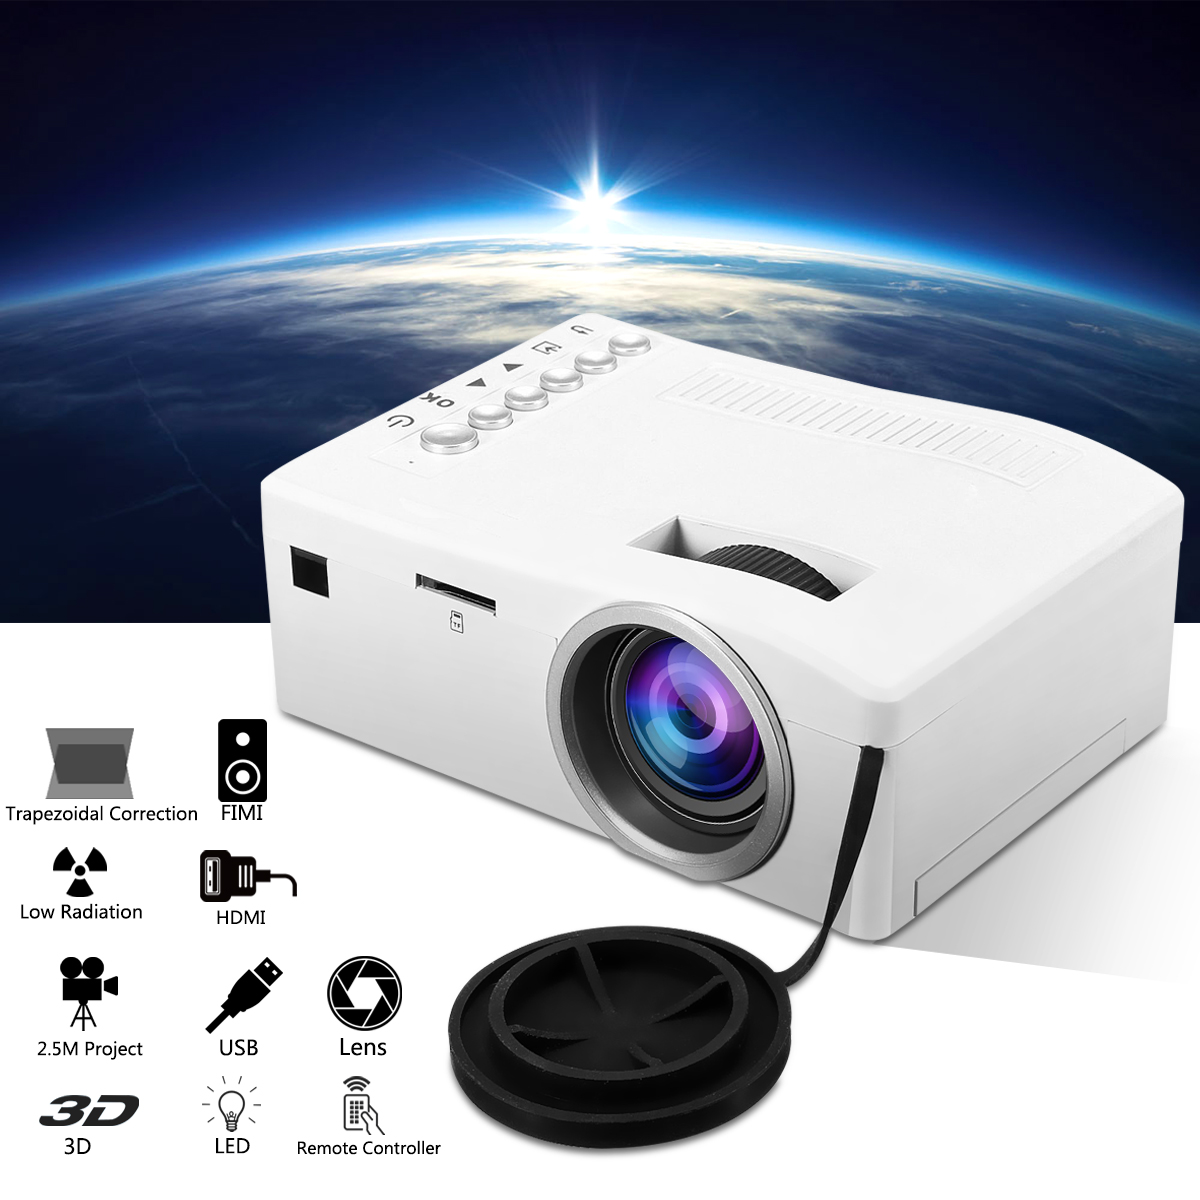 Светодиодный мини Портативный 400 люмен проектор Full HD 1080 P 320x180 Разрешение дома Театр Кино VGA ПК USB SD AV Вход HDMI